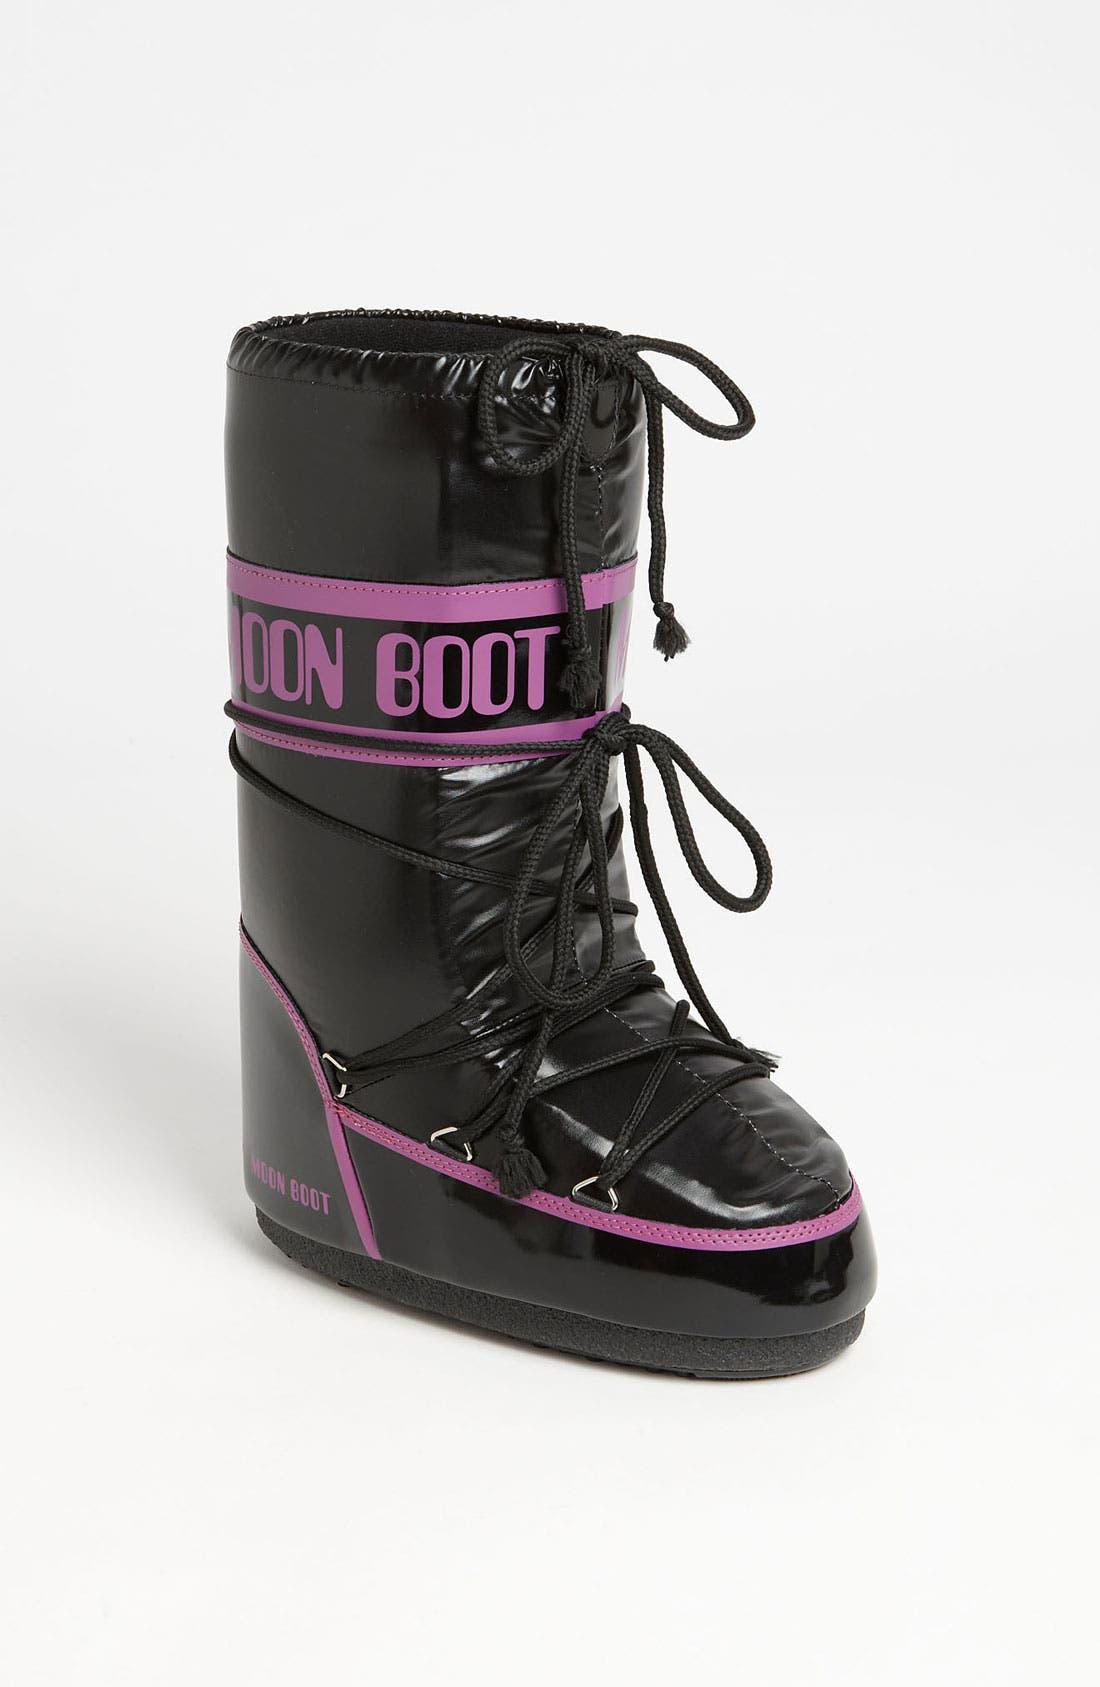 Alternate Image 1 Selected - Tecnica® 'Splash' Moon Boot®